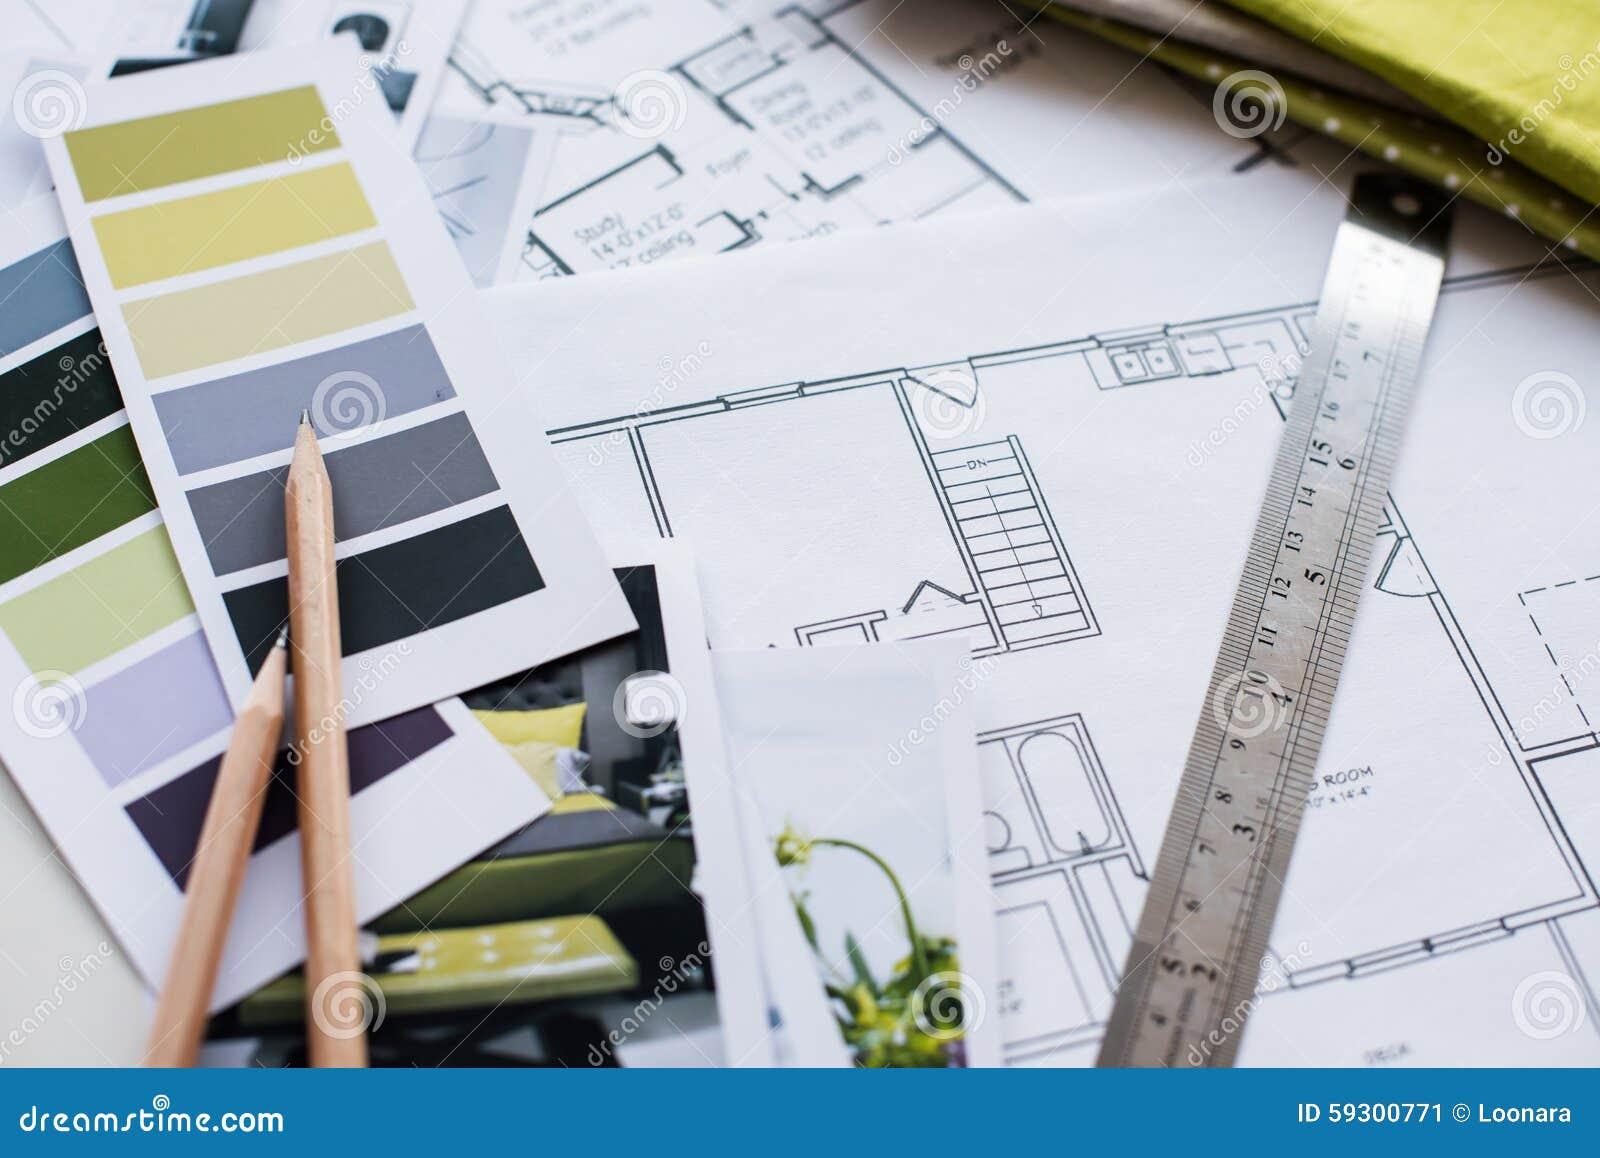 Interior Design Furniture Proposal ~ Interior designers working table stock photo image